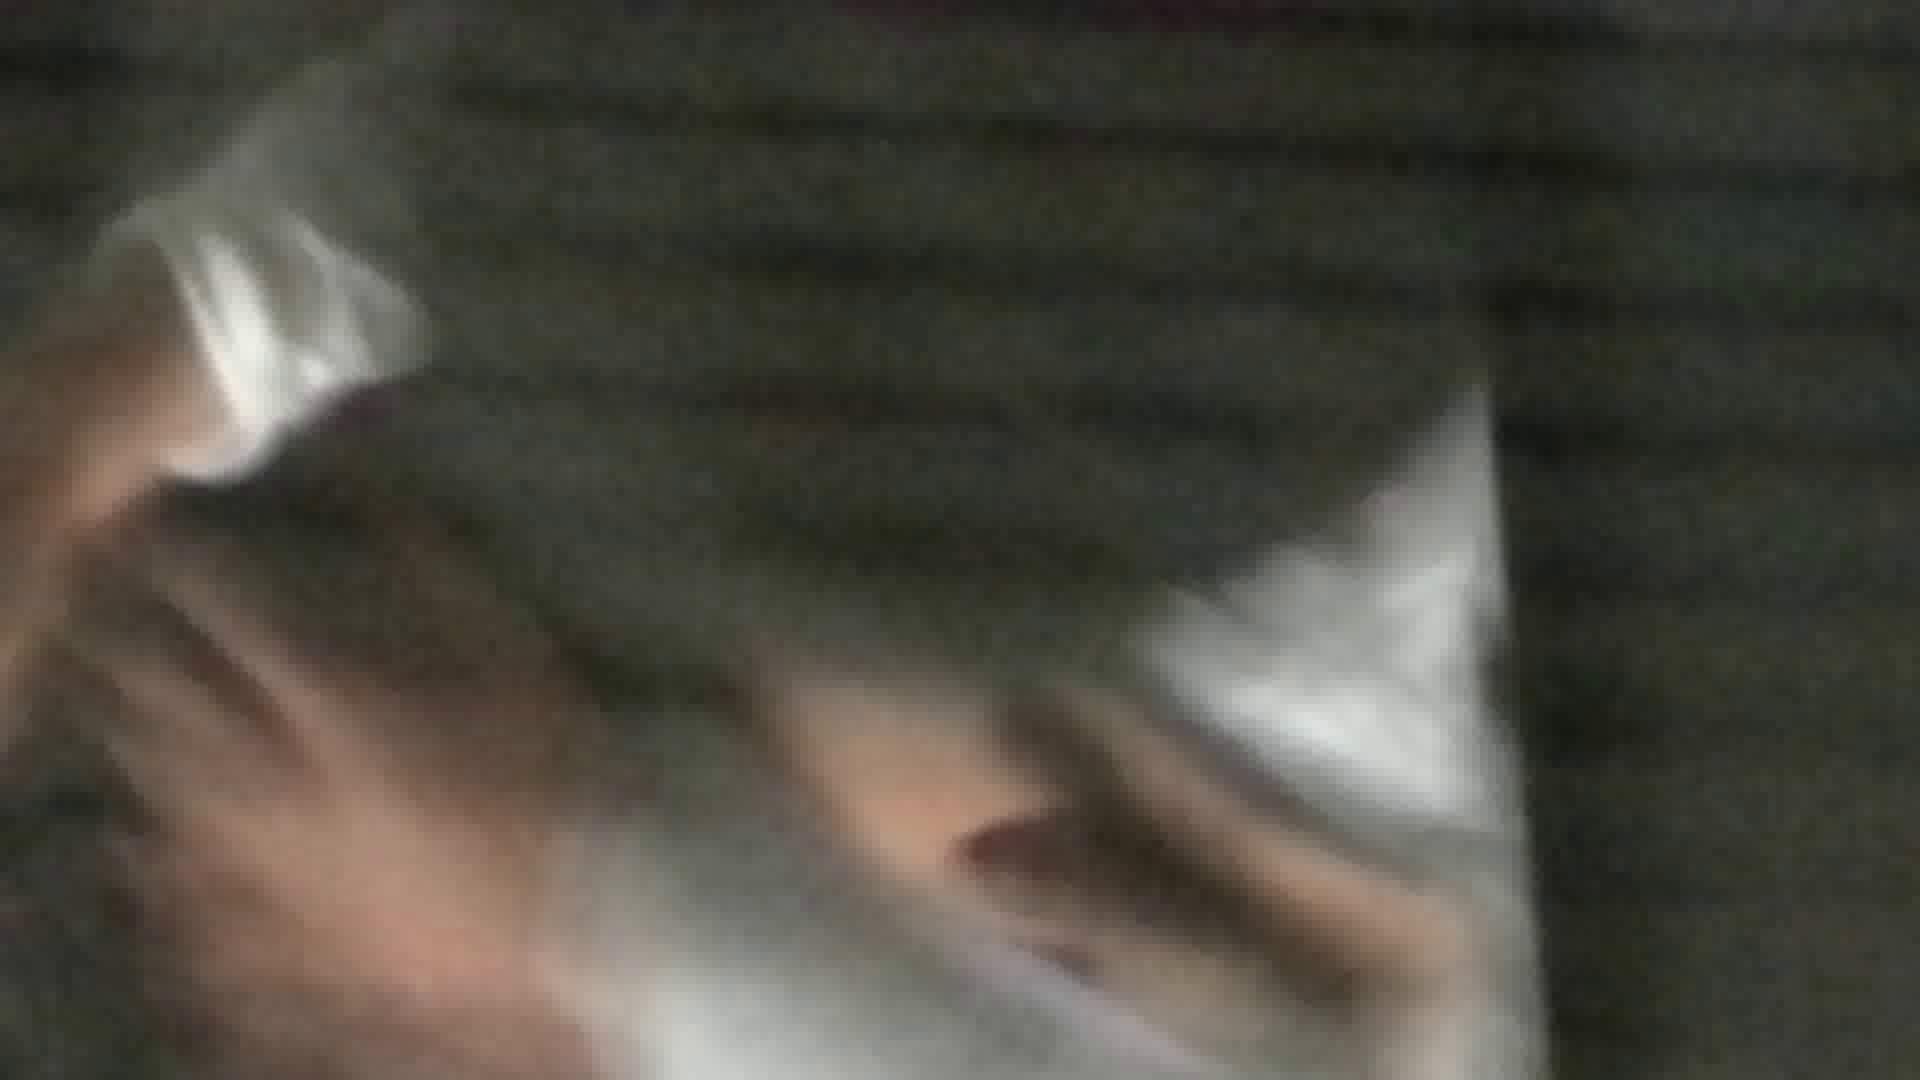 SPYさん初投稿!マンション覗き!5000K!ハイビジョン撮影VOL.03(元野球部社会人編) 完全無修正  109pic 9